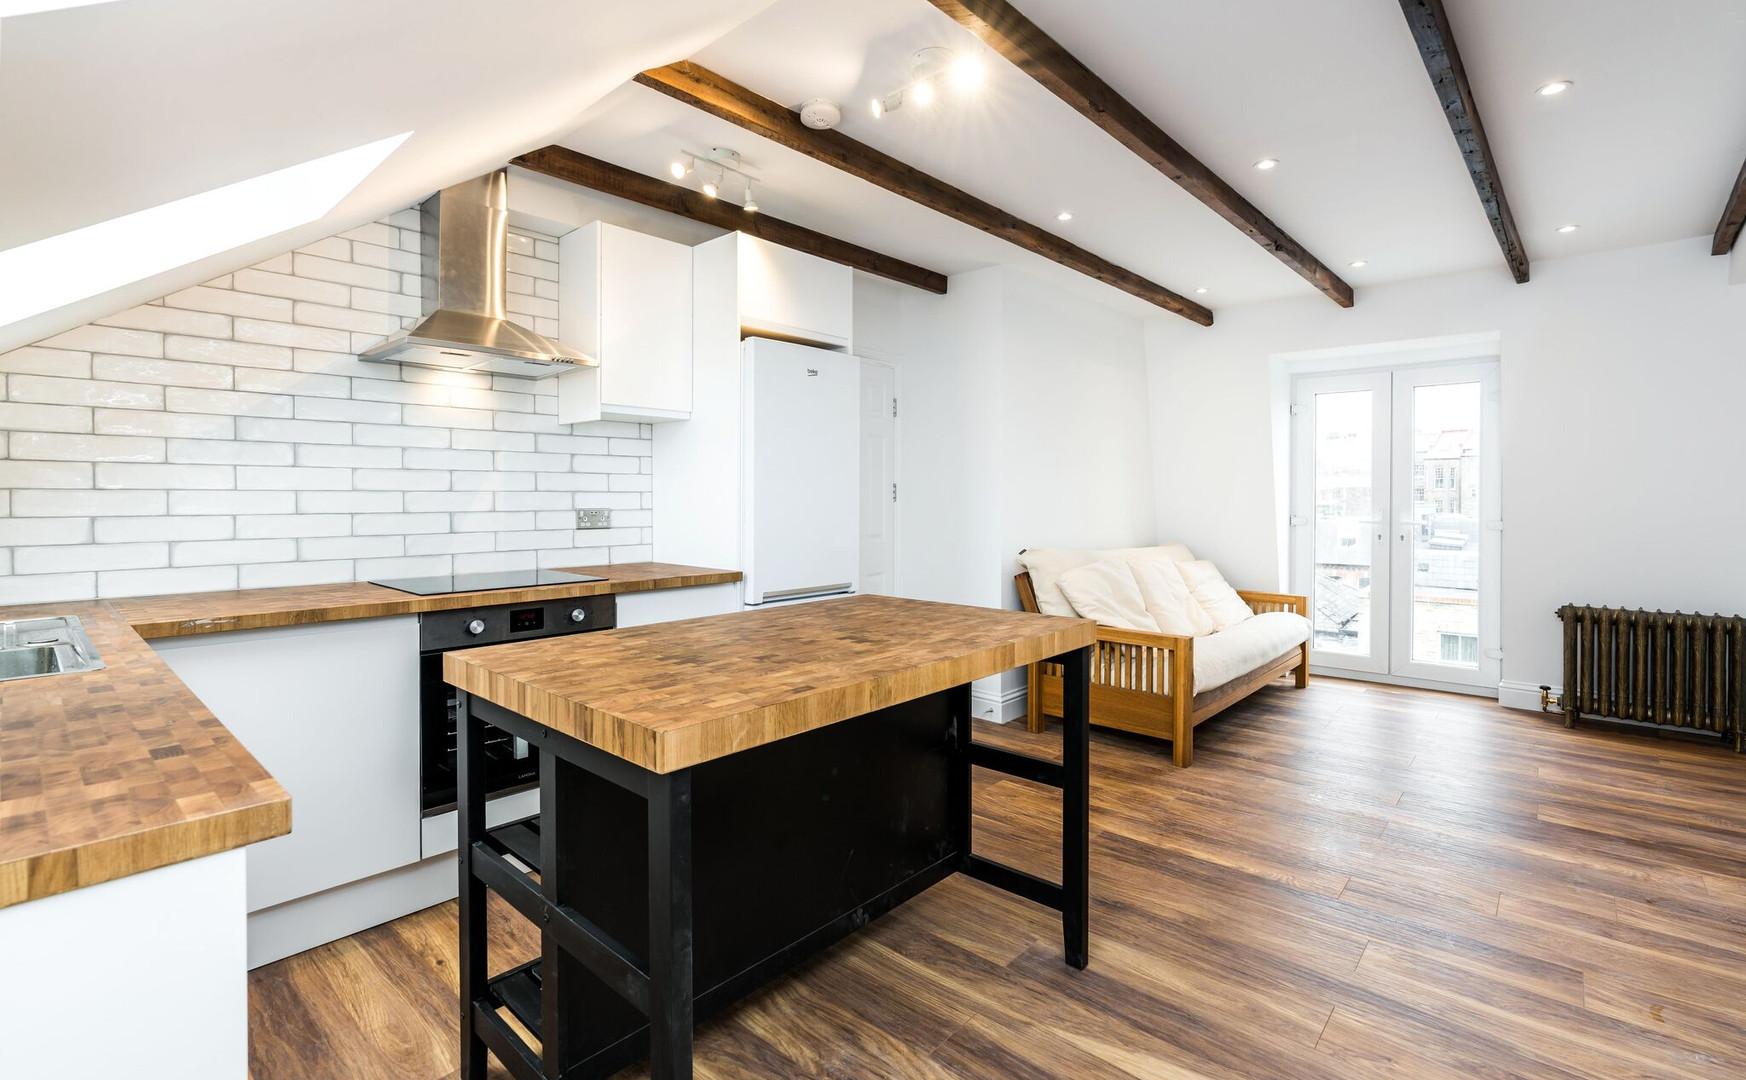 Loft - Ktichen and Living Space.jpeg